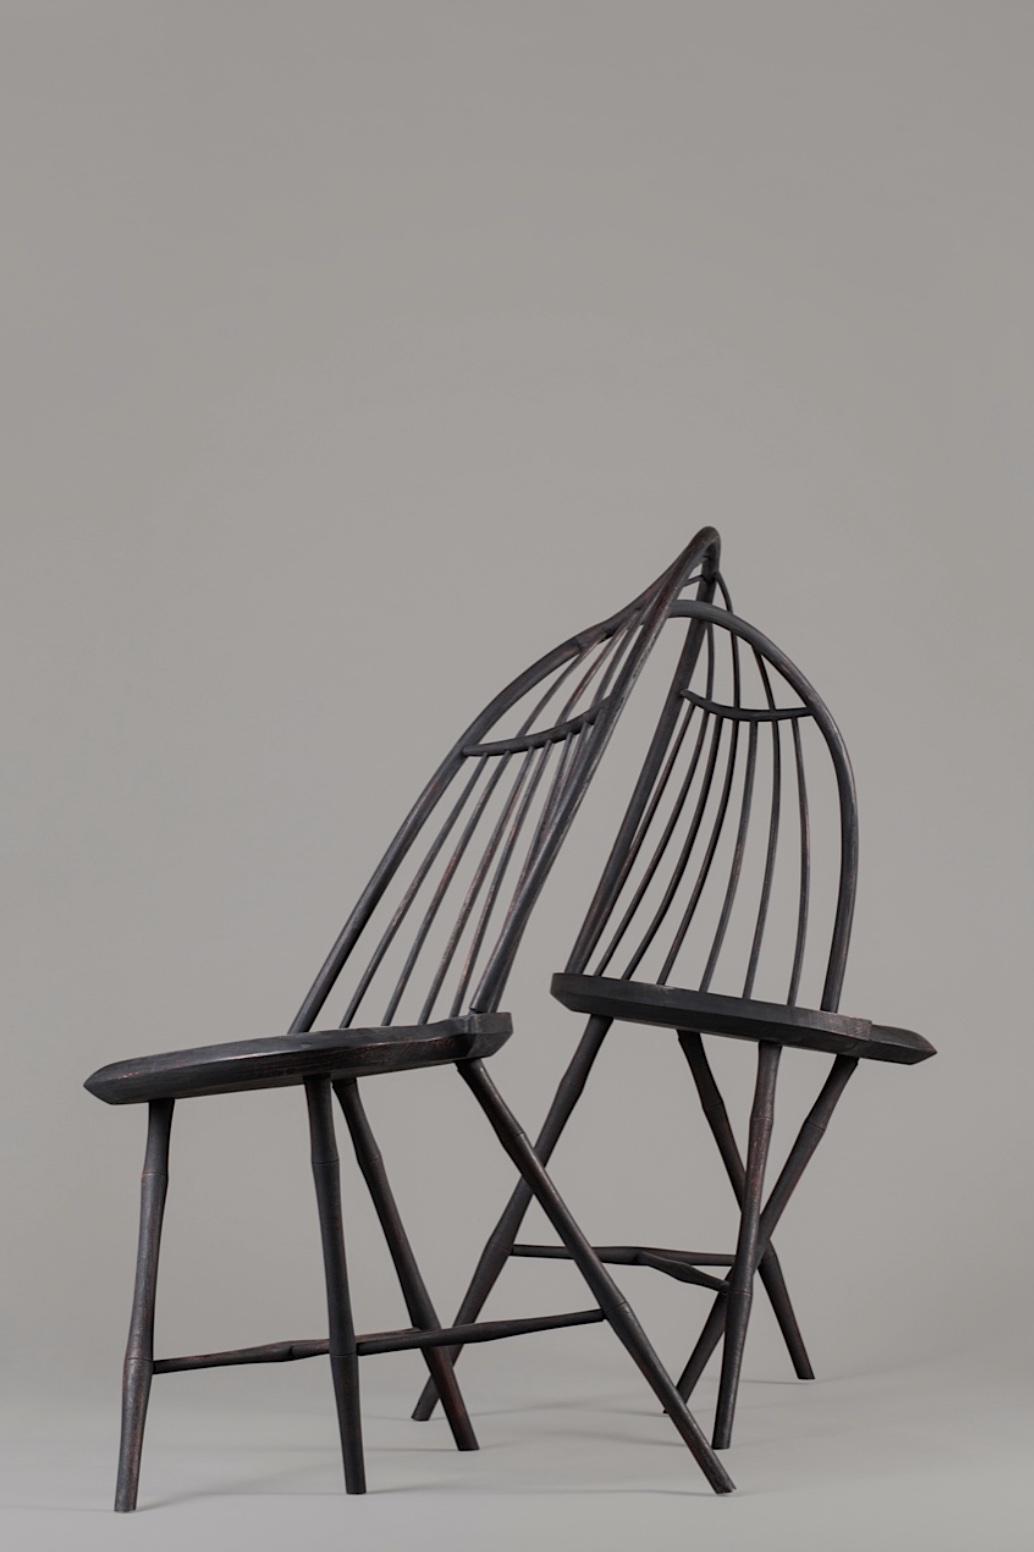 A Typical Windsor Form, 2004, by artist Christopher Kurtz.